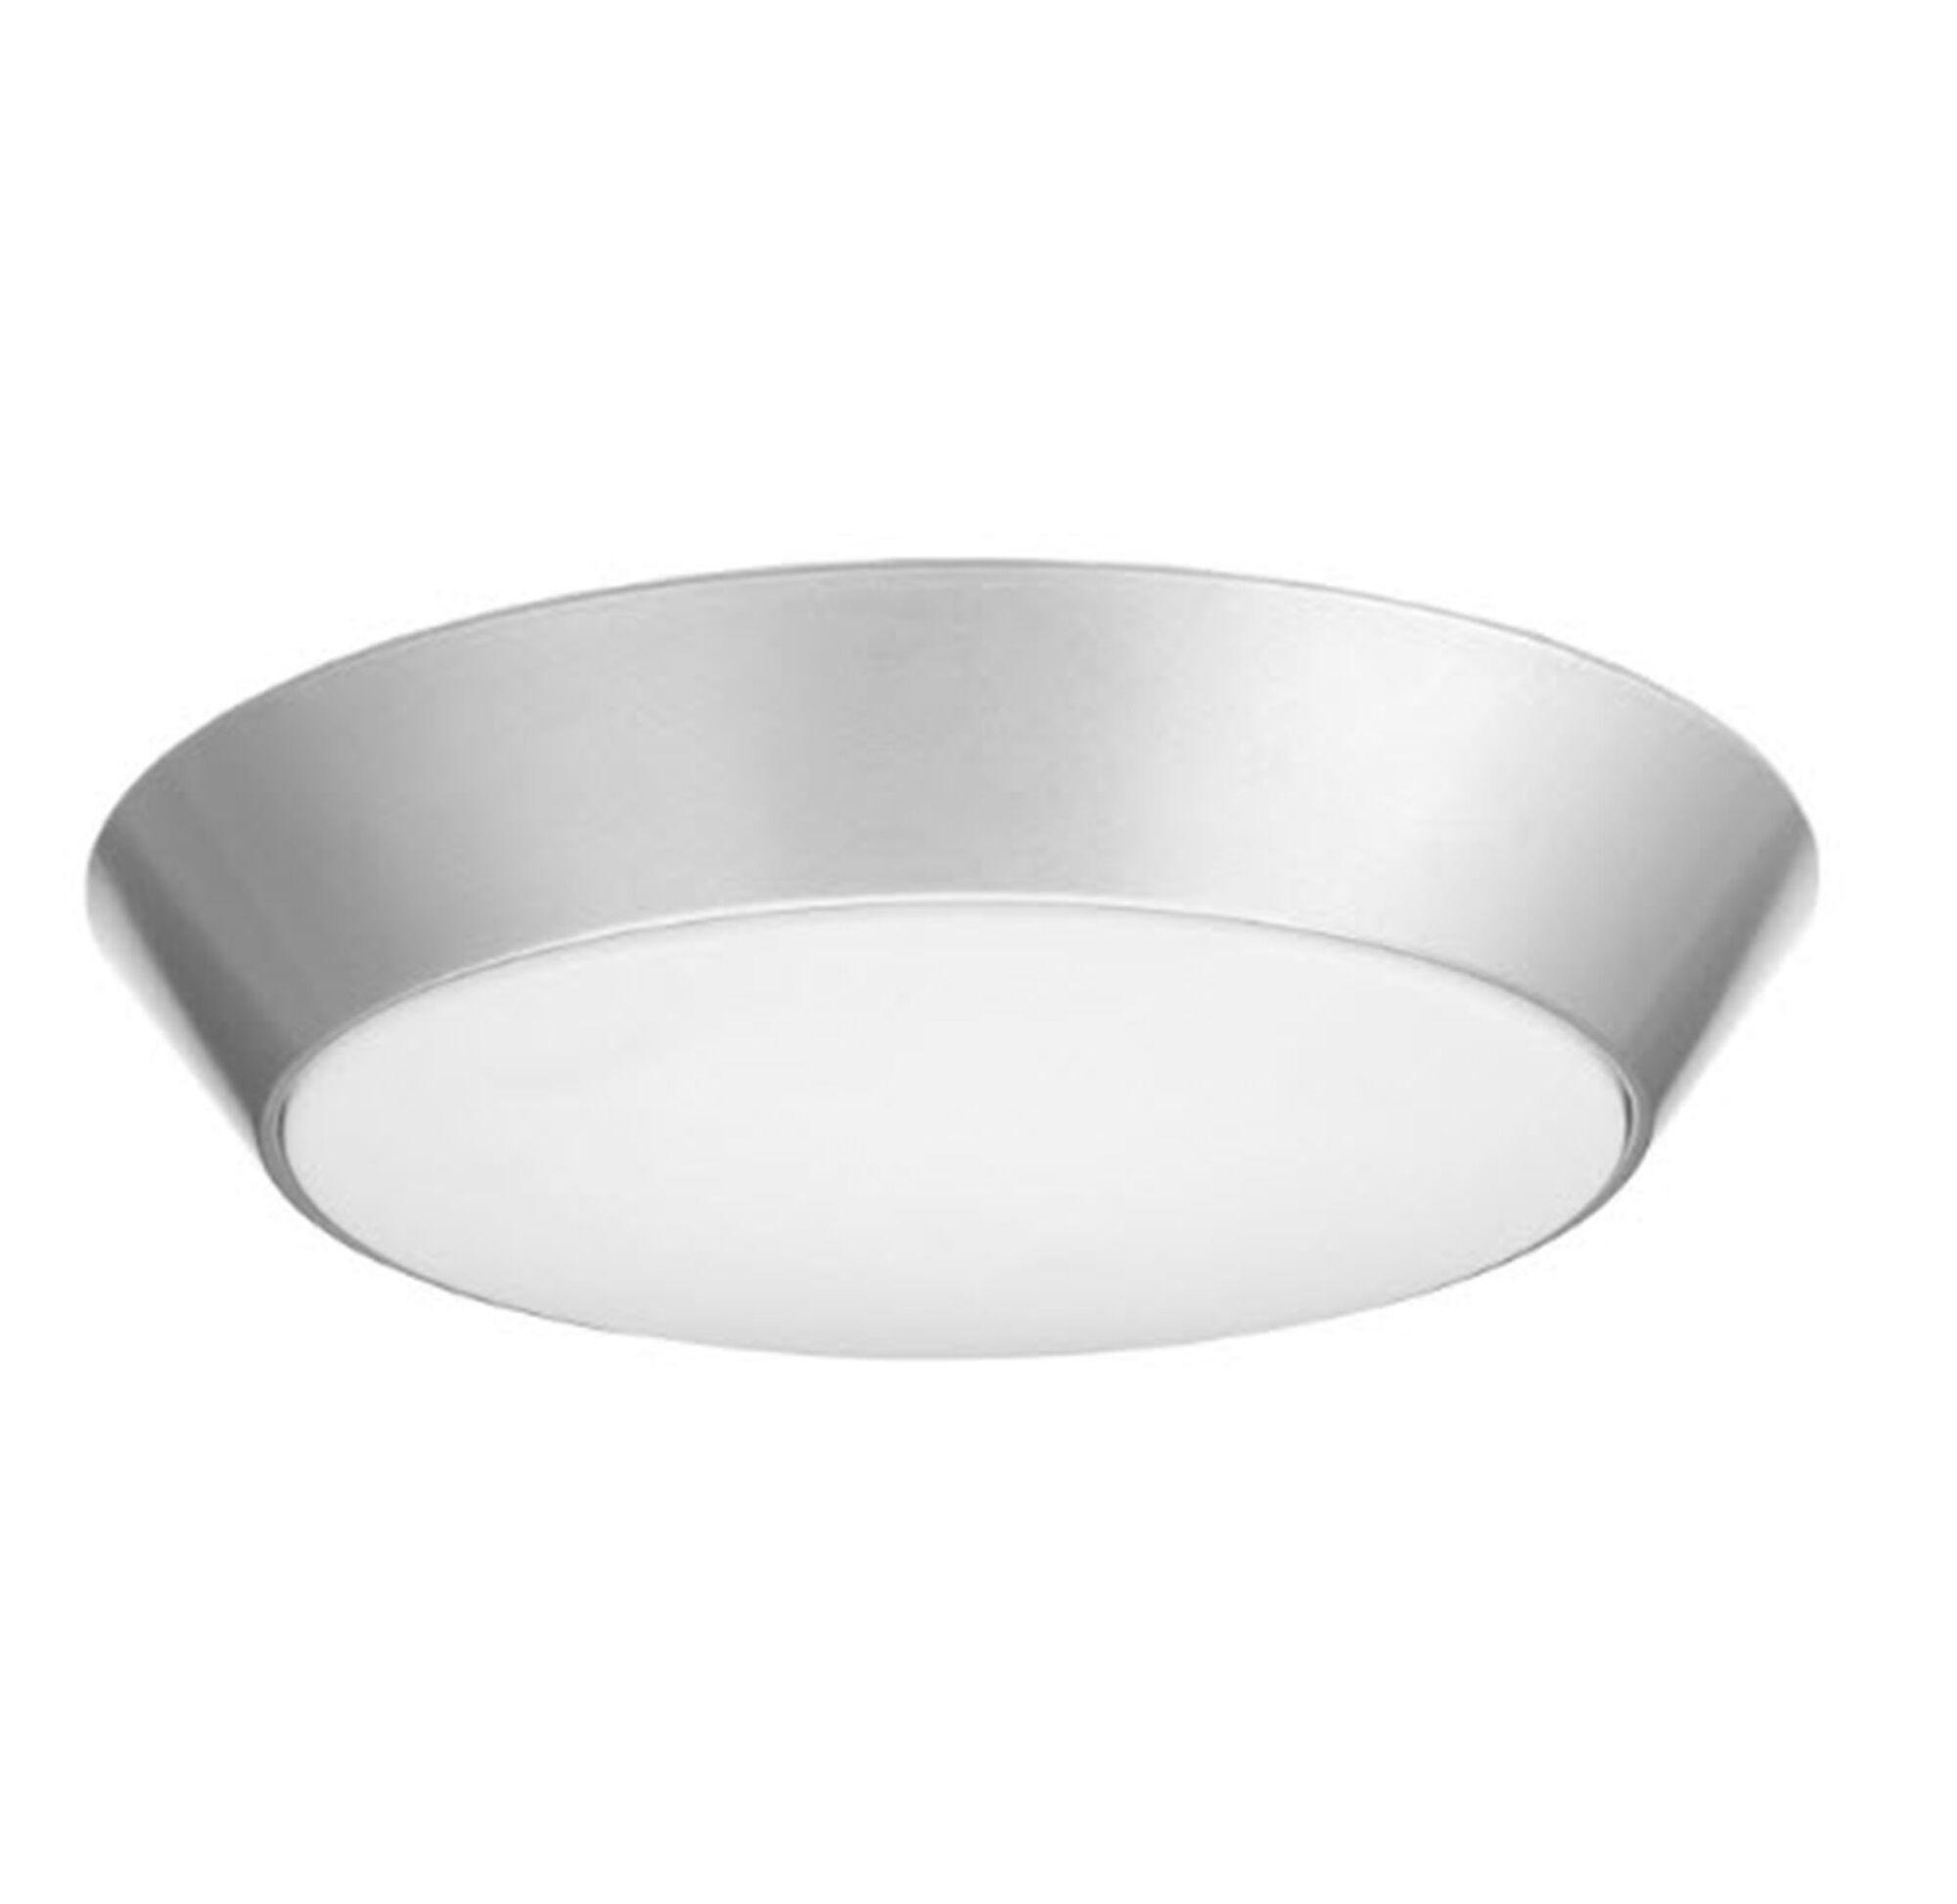 Versi LED Flush Mount Finish: Nickel, Bulb Color Temperature: 4000K